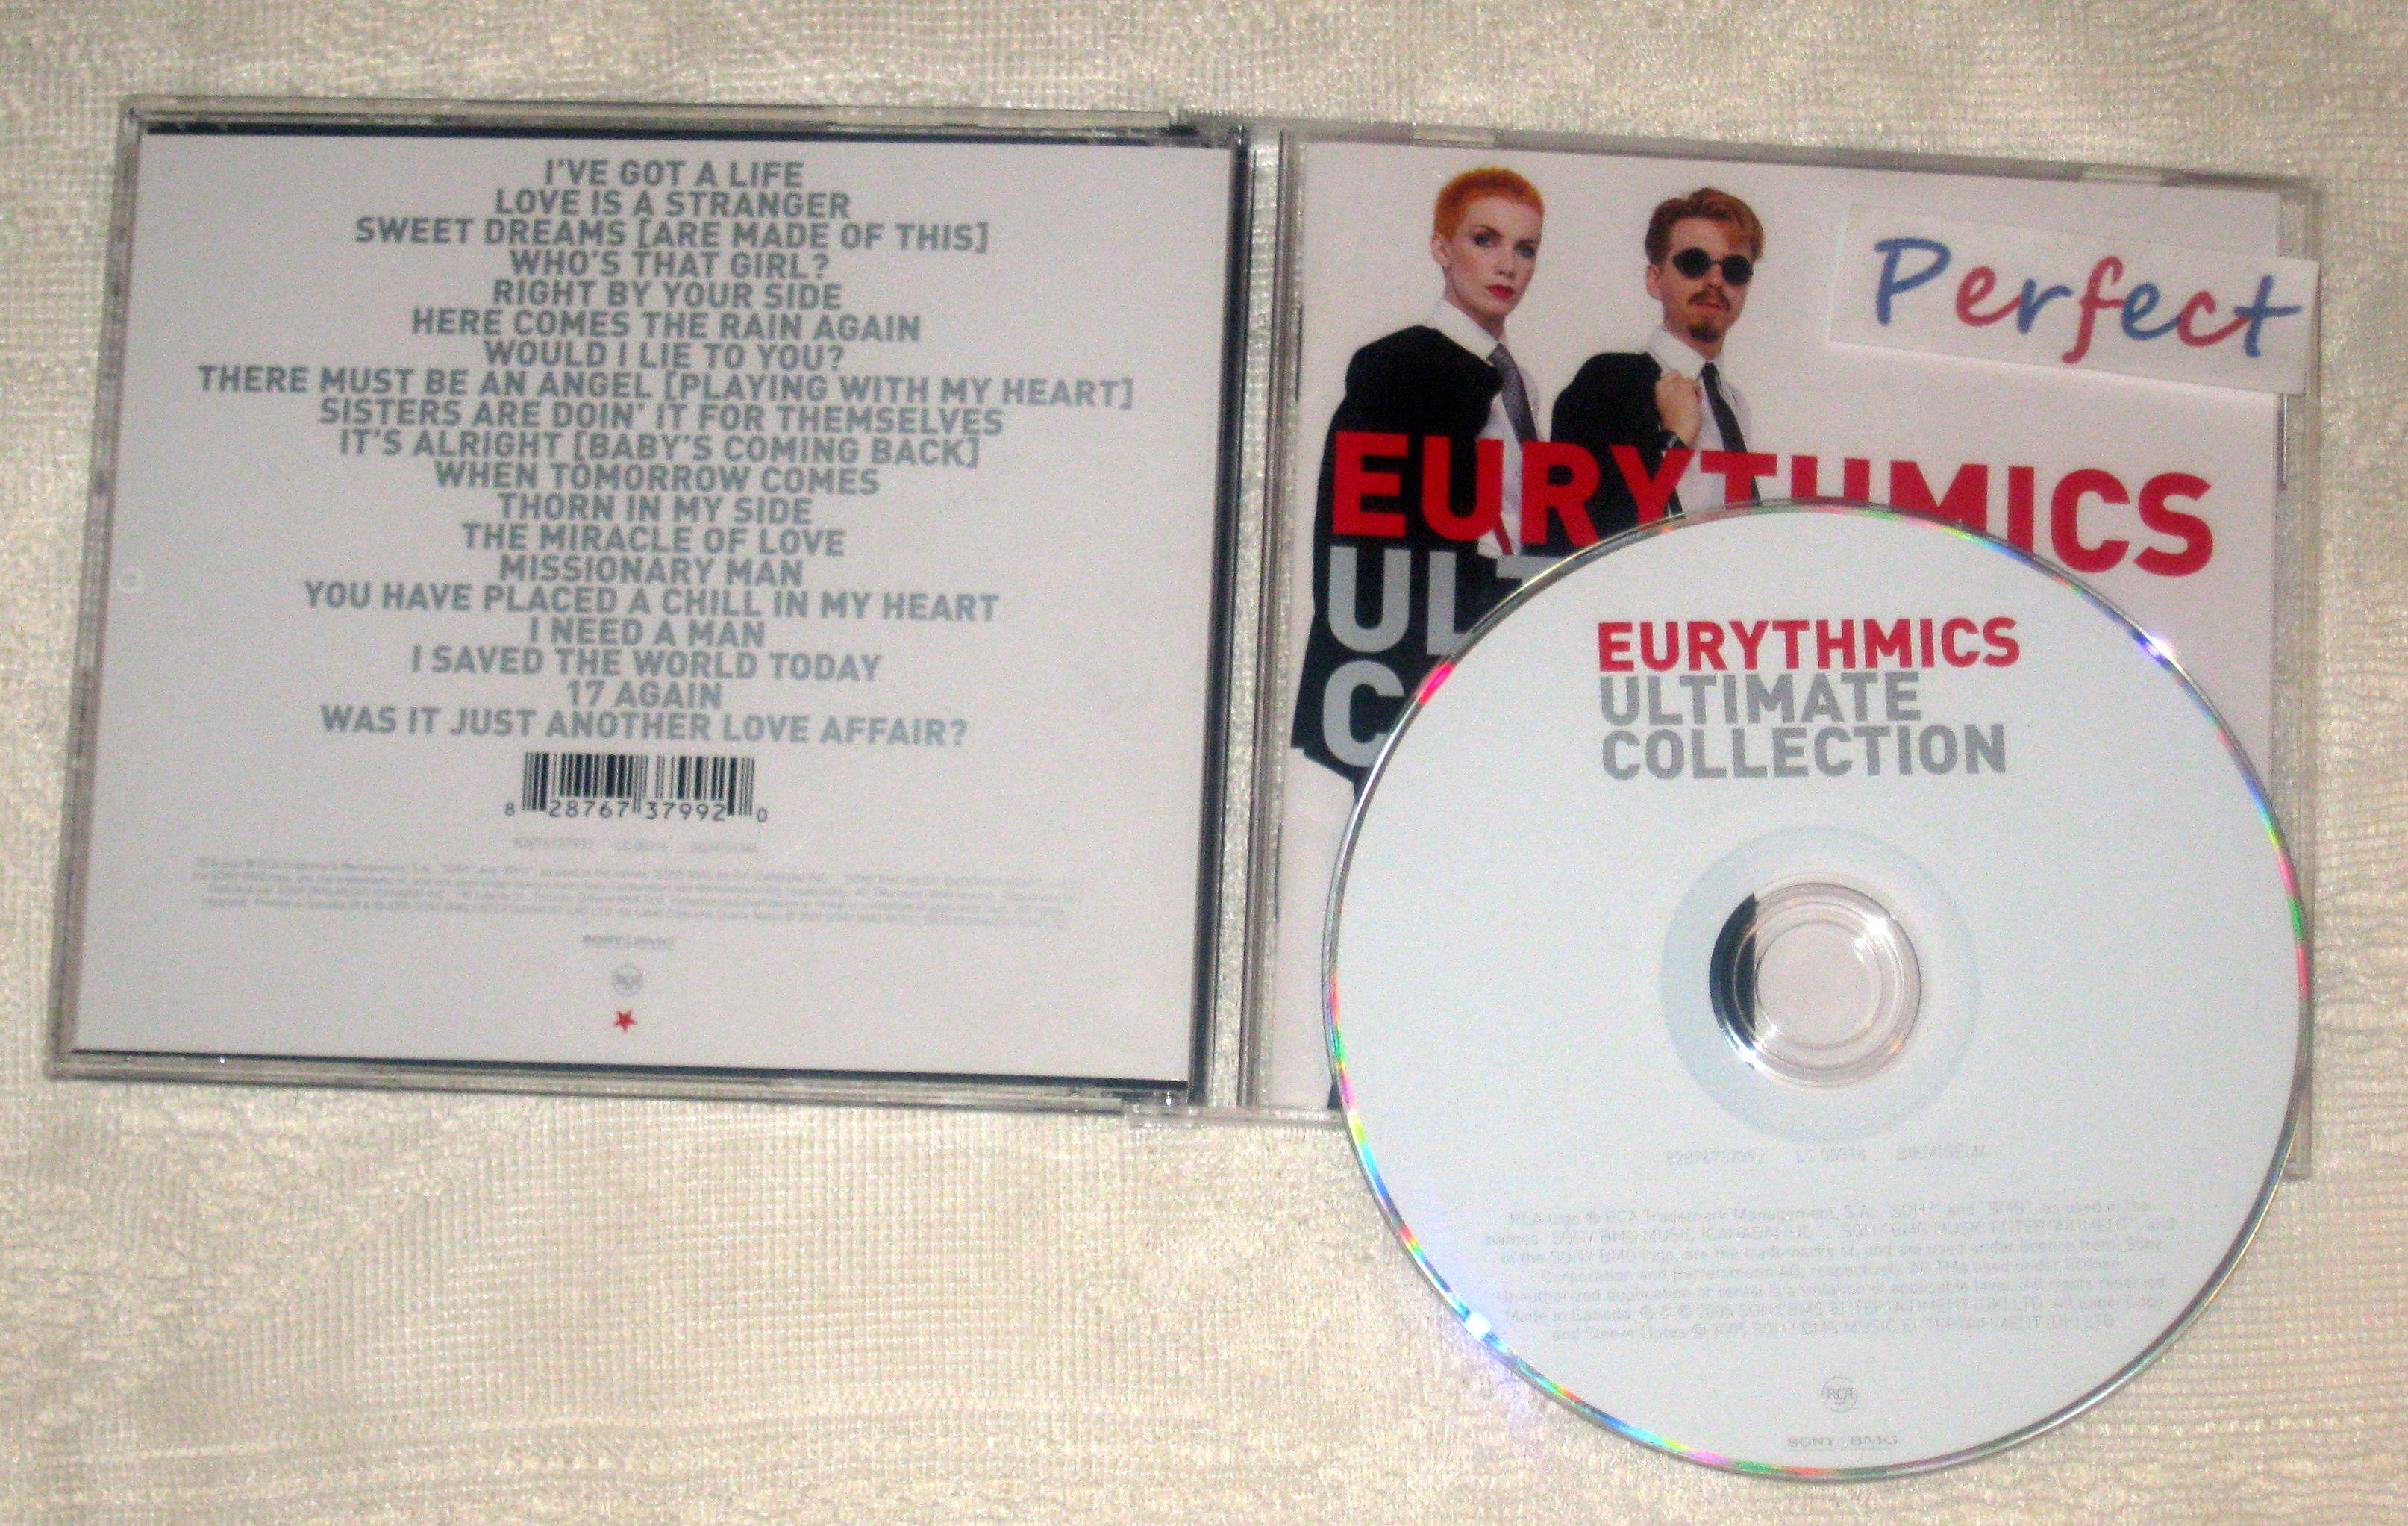 Eurythmics Ultimate Collection: Eurythmics-Ultimate_Collection-CD-FLAC-2005-PERFECT